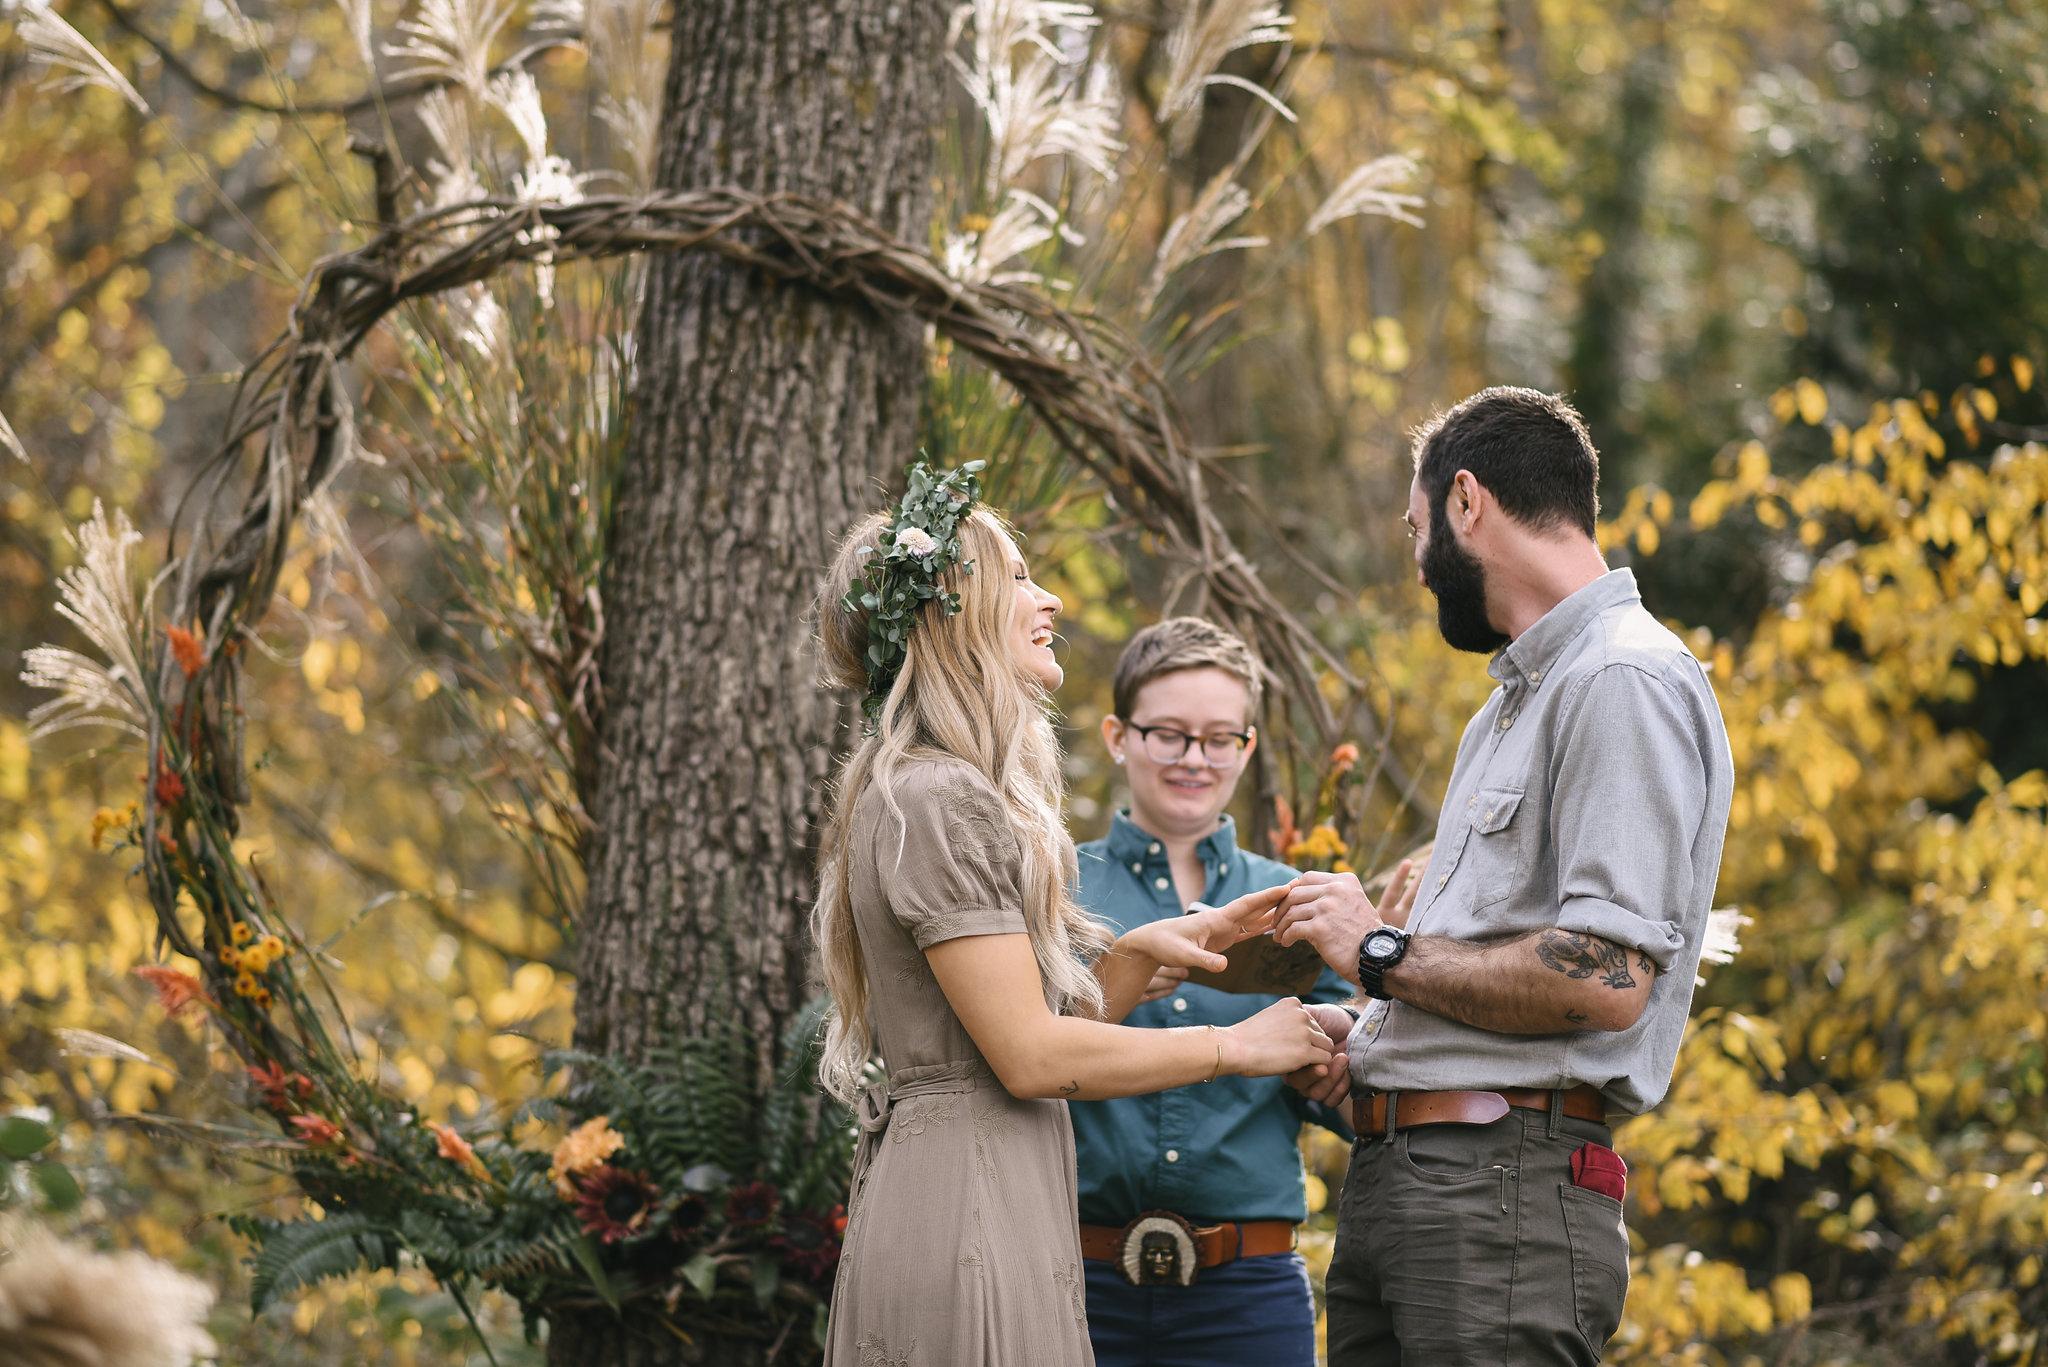 Baltimore, Maryland Wedding Photographer, Backyard Wedding, DIY, Rustic, Casual, Fall Wedding, Woodland, Bride and Groom Laughing During Ceremony